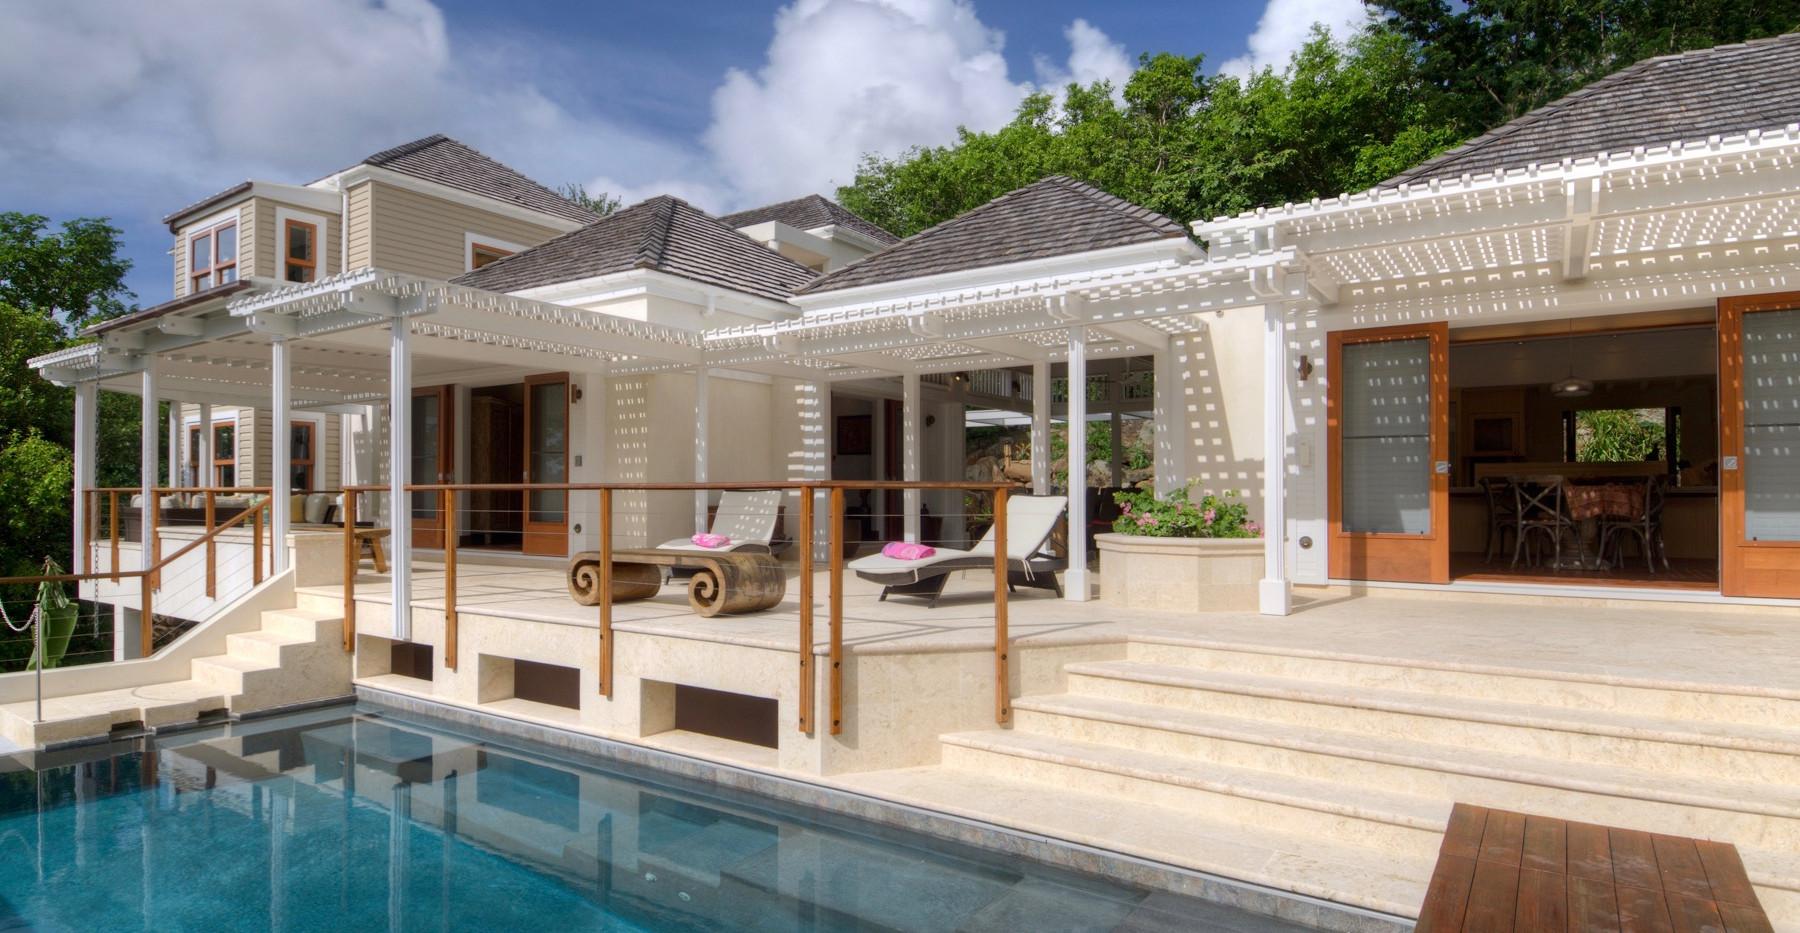 Villa-parvati-little-bay-bvi-04-Pool are